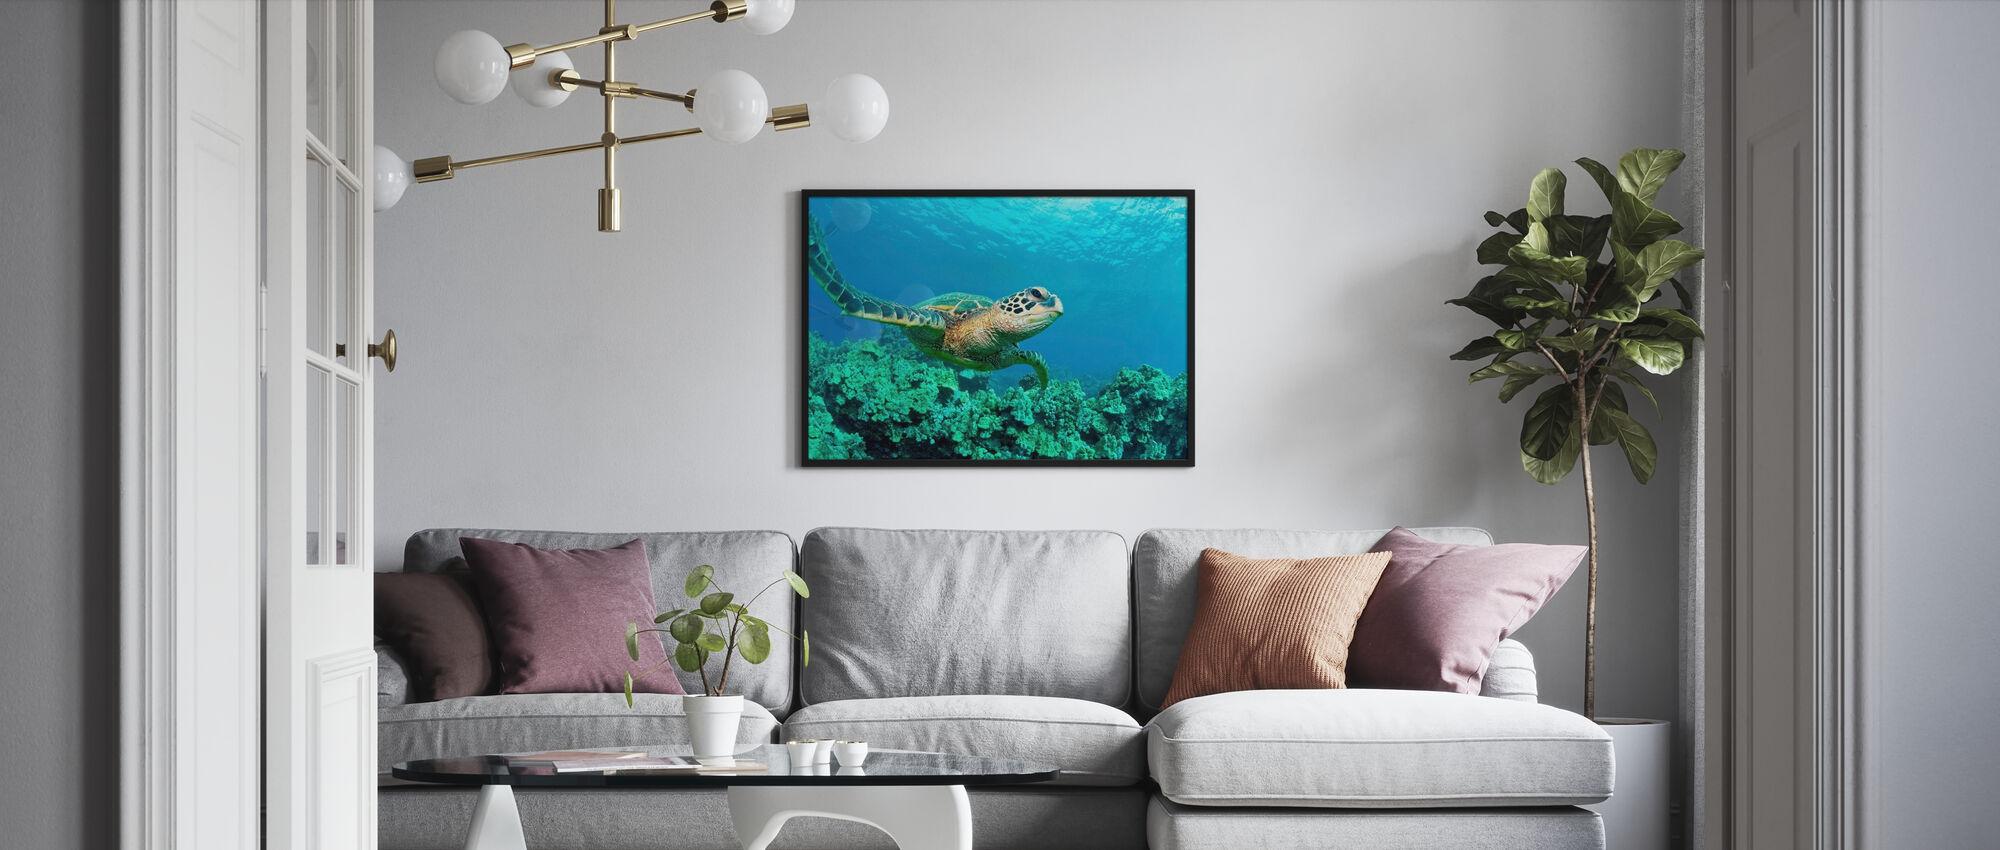 Havssköldpadda i korall - Inramad tavla - Vardagsrum